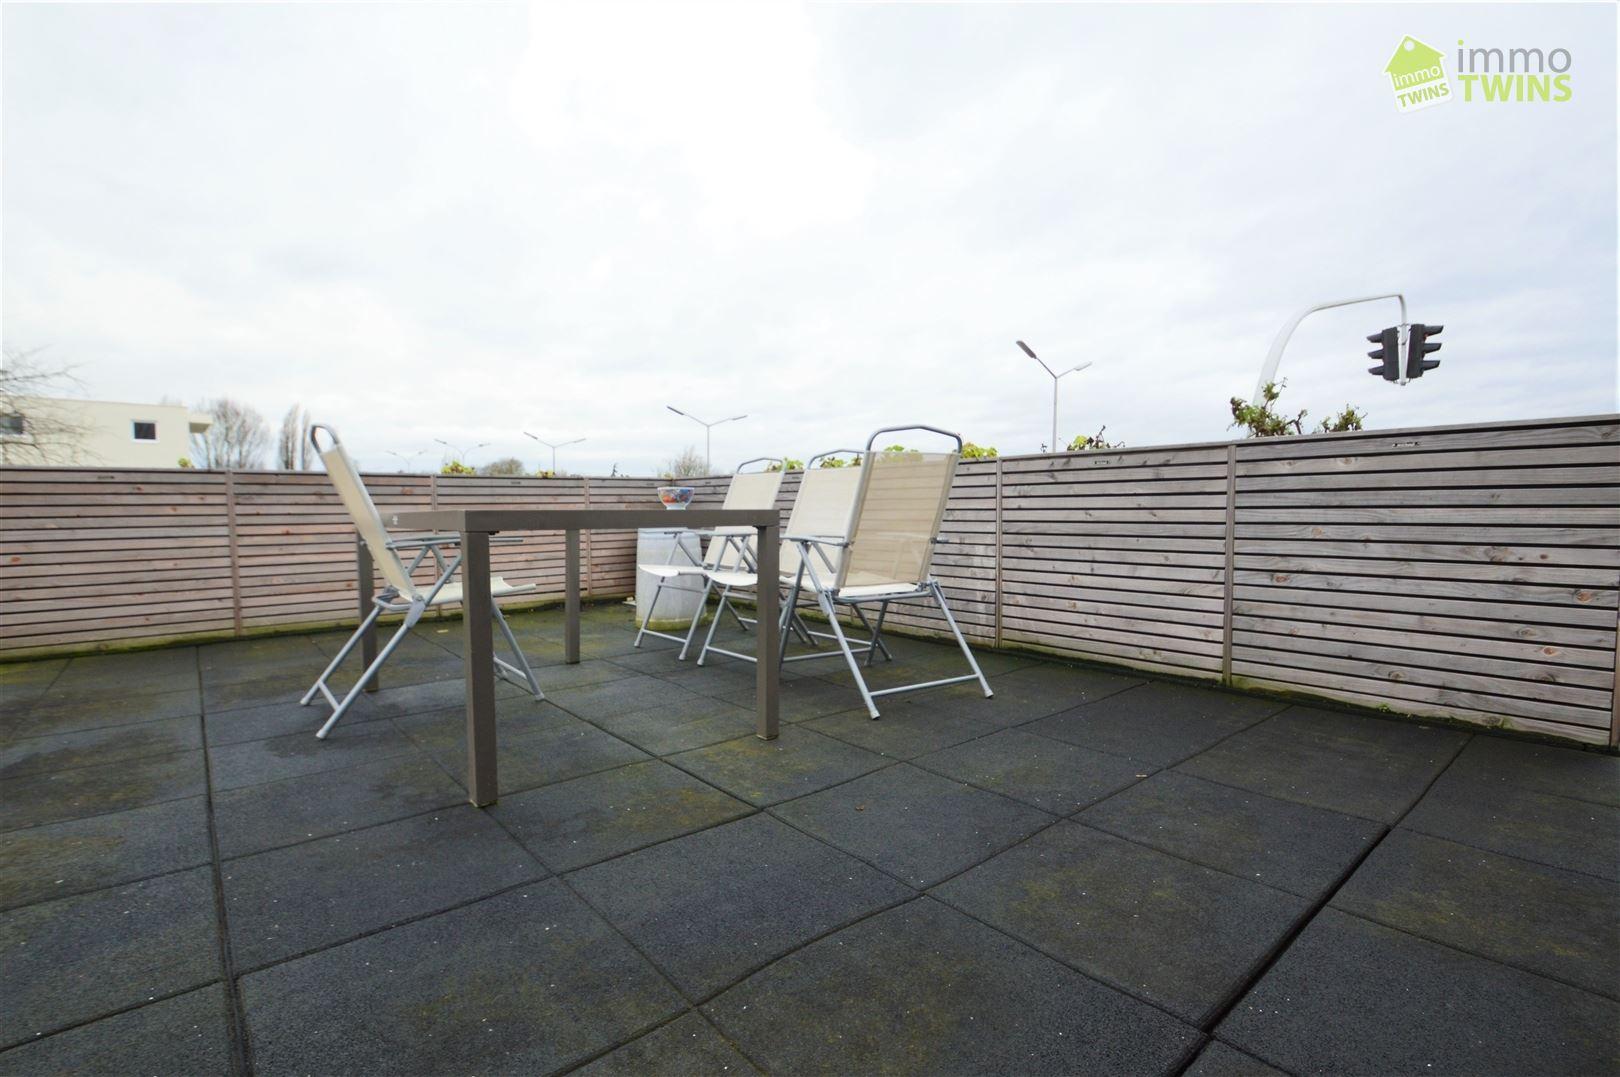 Foto 10 : Duplex/triplex te 9200 DENDERMONDE (België) - Prijs € 650